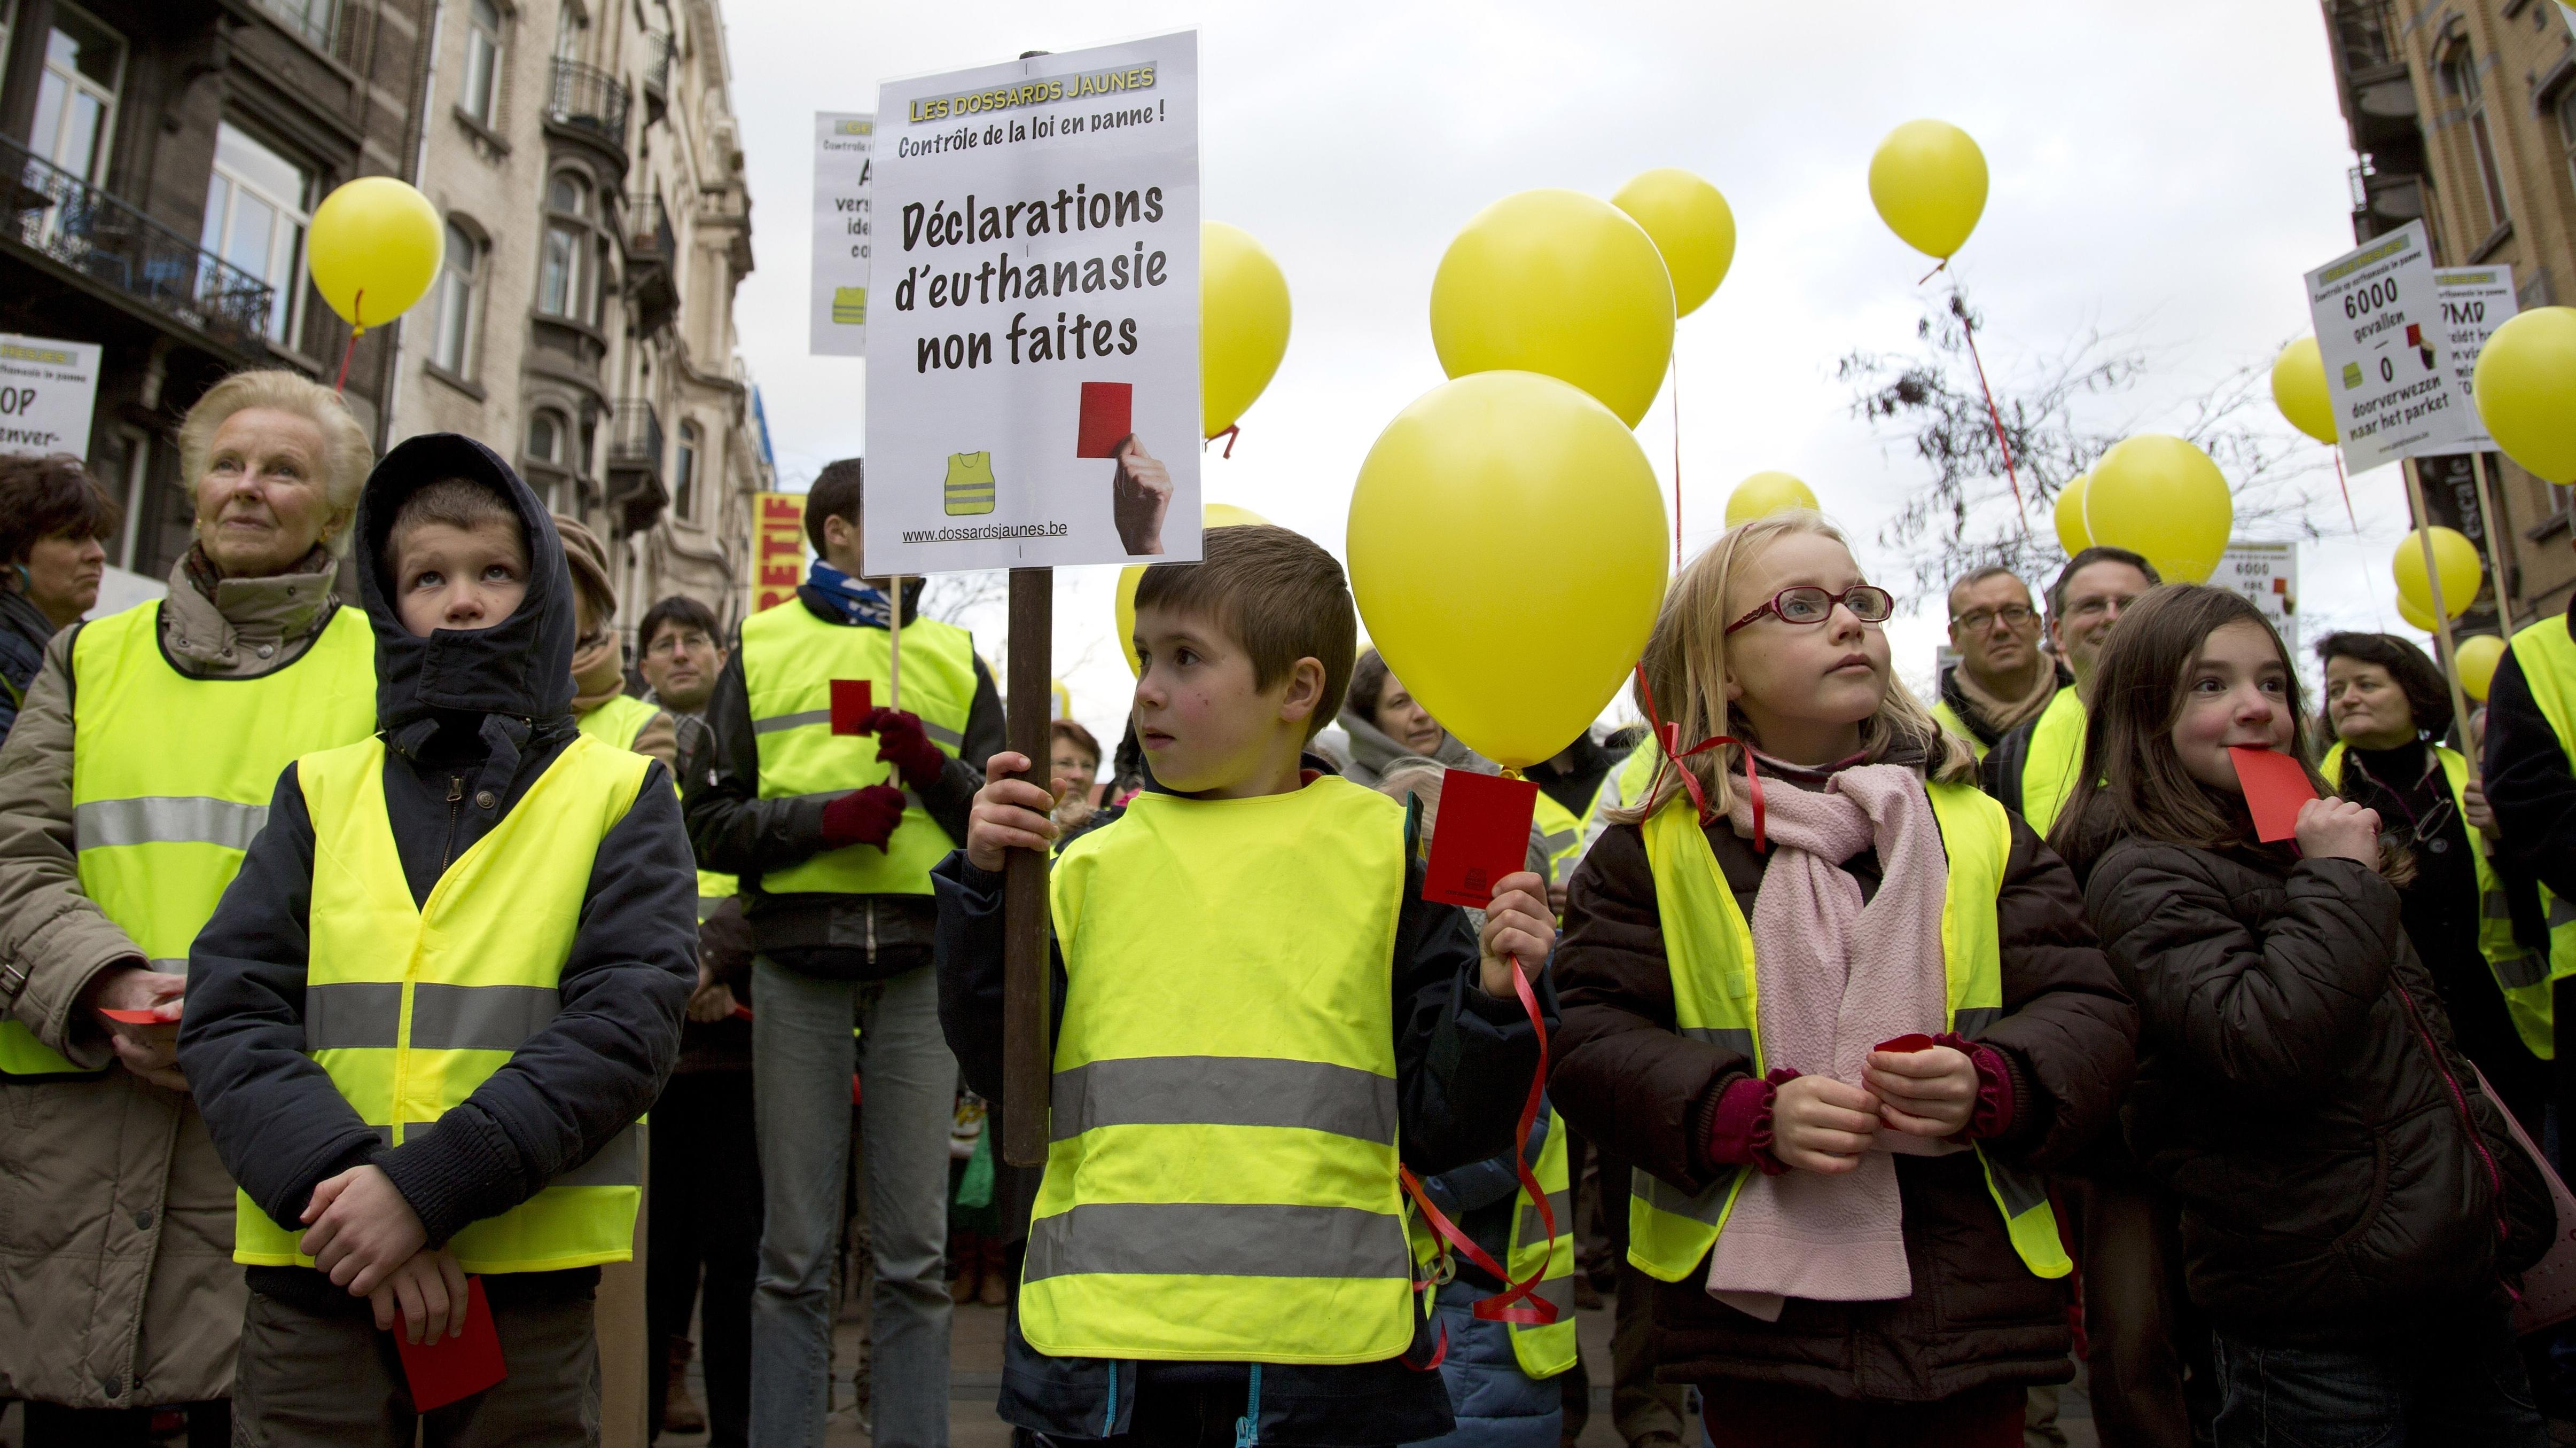 Belgian Proposal: Terminally Ill Kids Could Choose Euthanasia